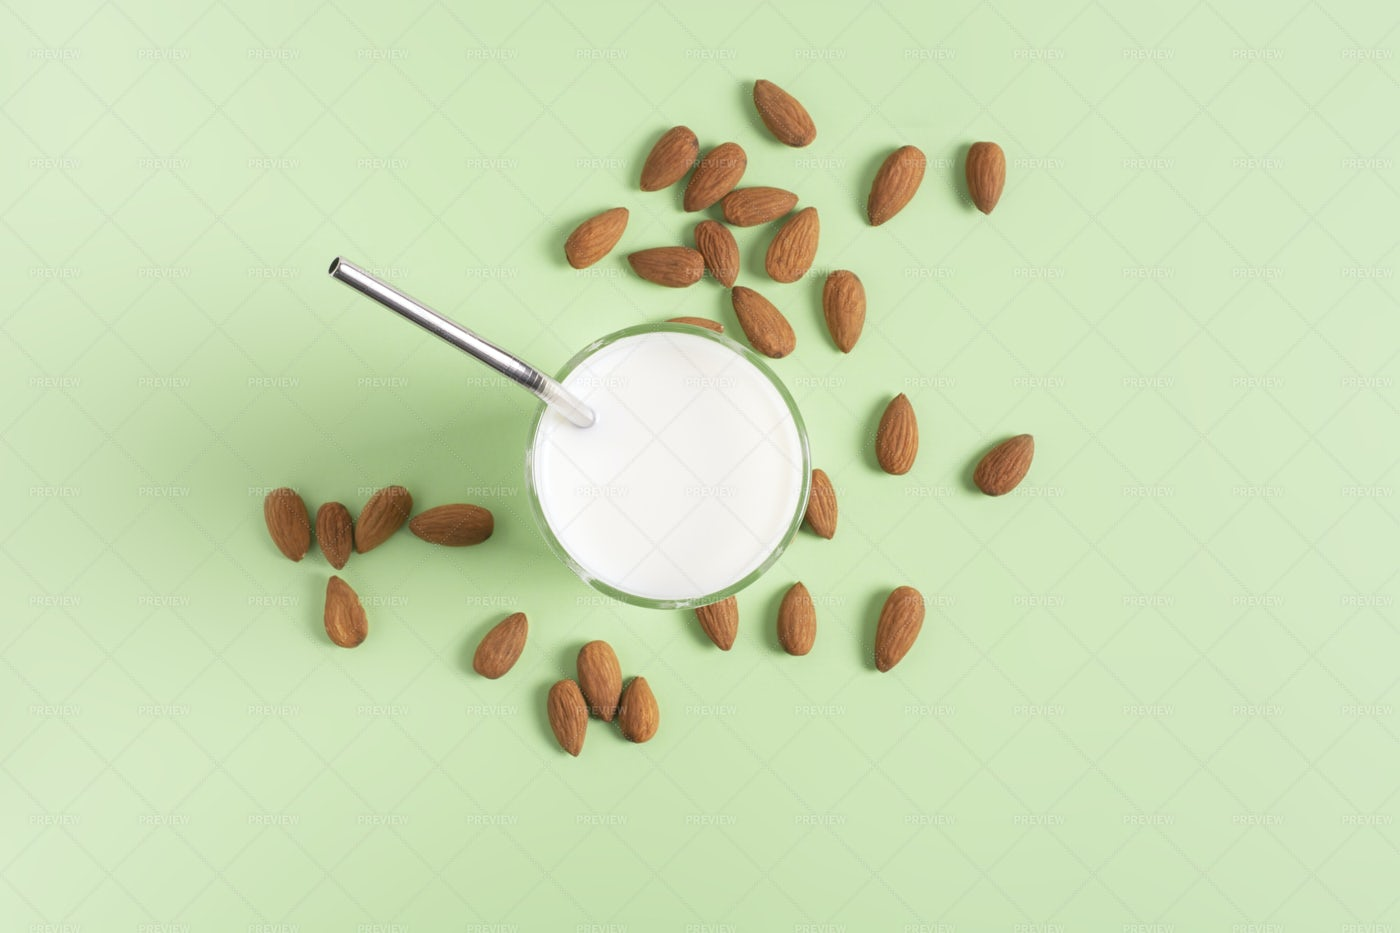 Almond Milk With A Straw: Stock Photos